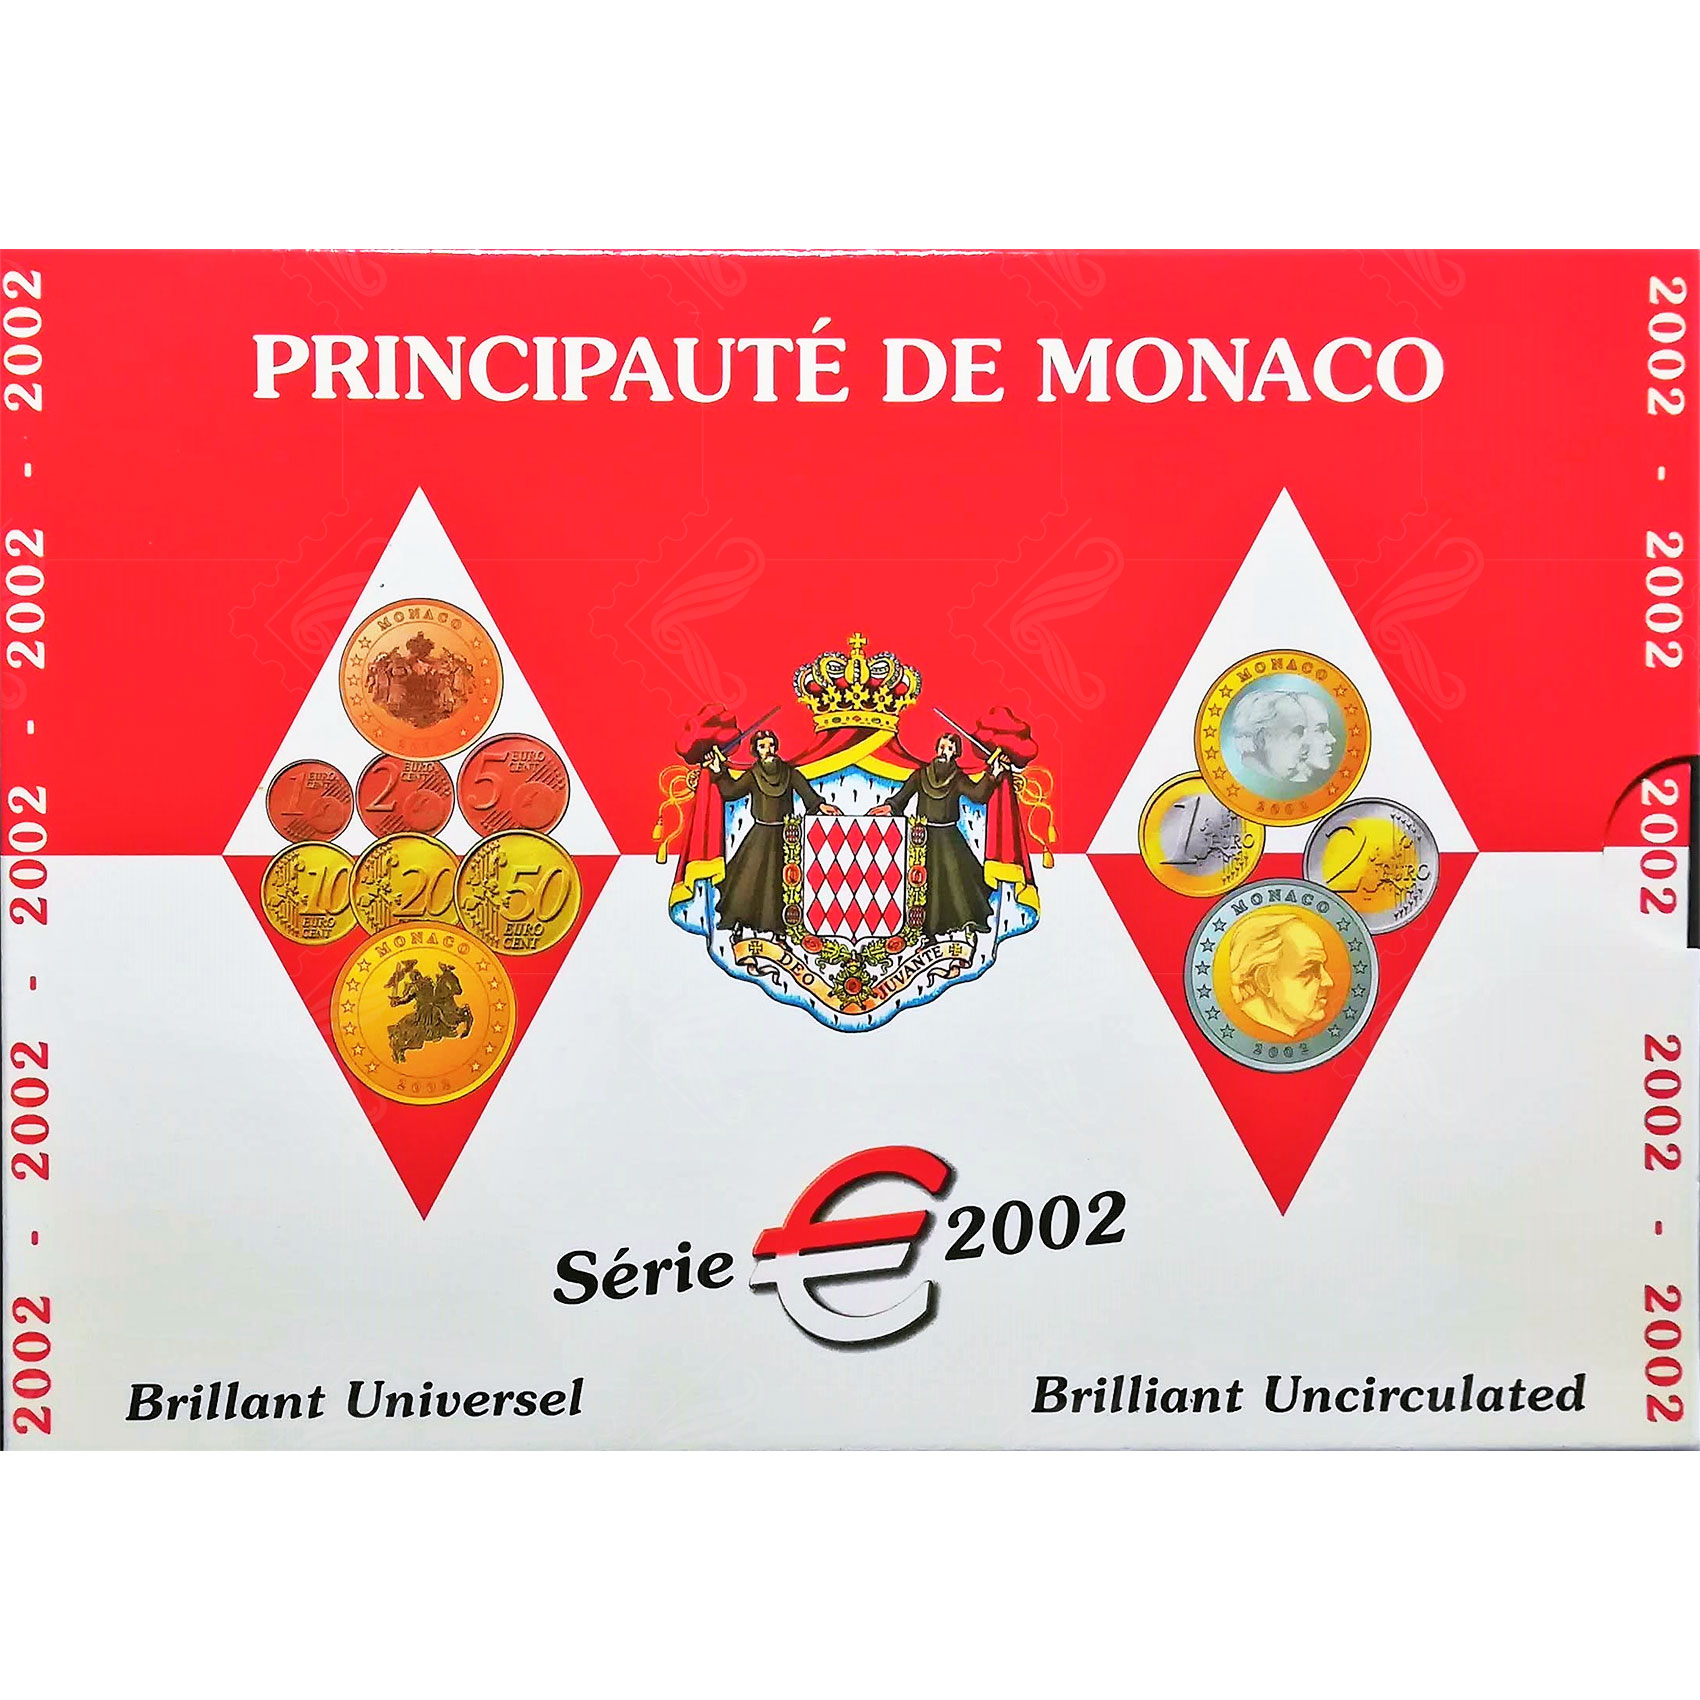 Divisionale Monaco 2002